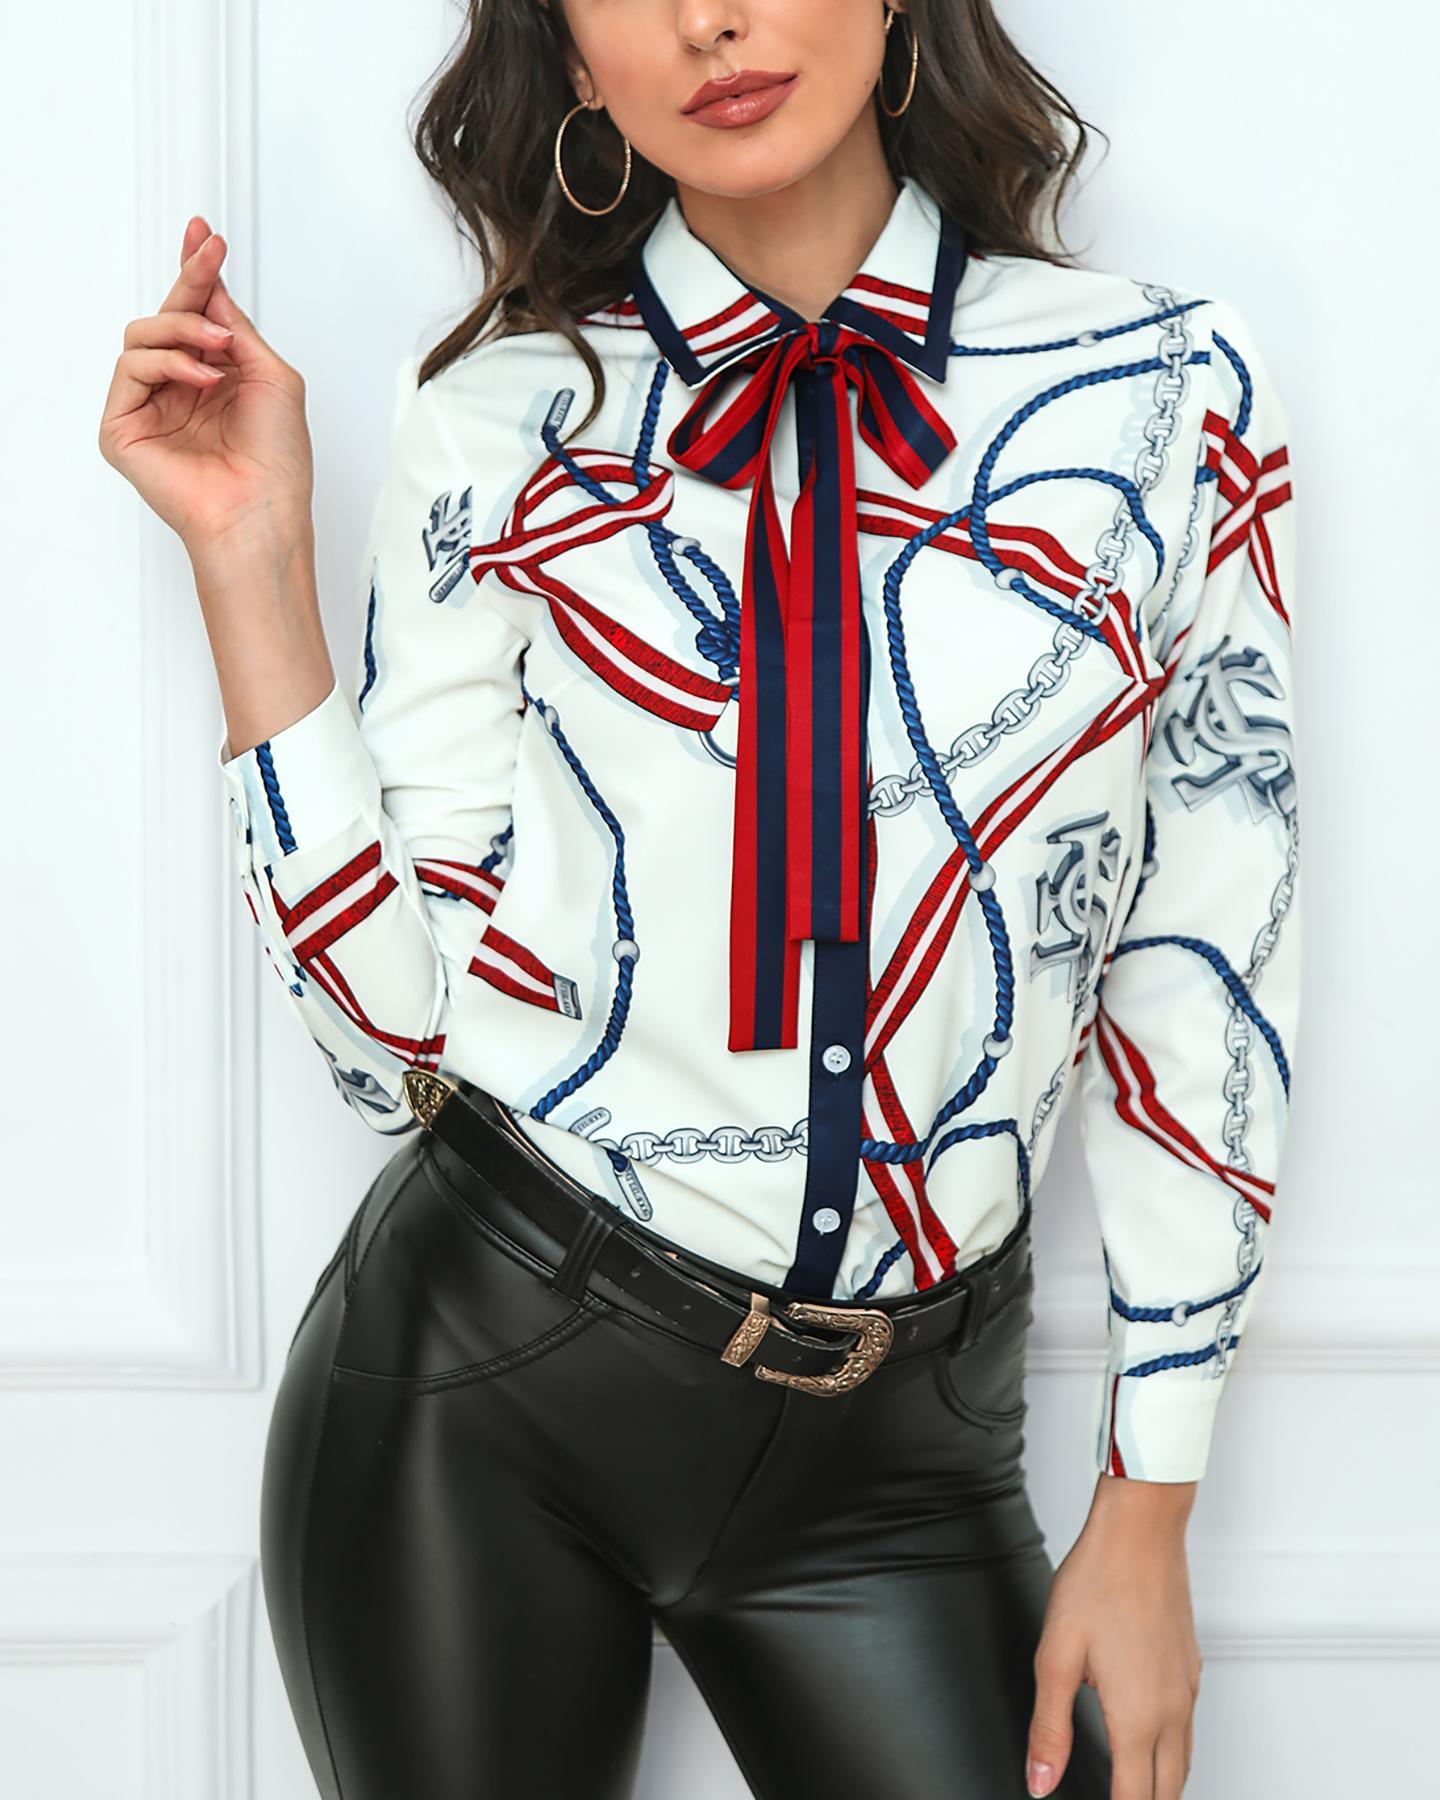 chicme / Camisa de manga larga bowknot estampado de cadena